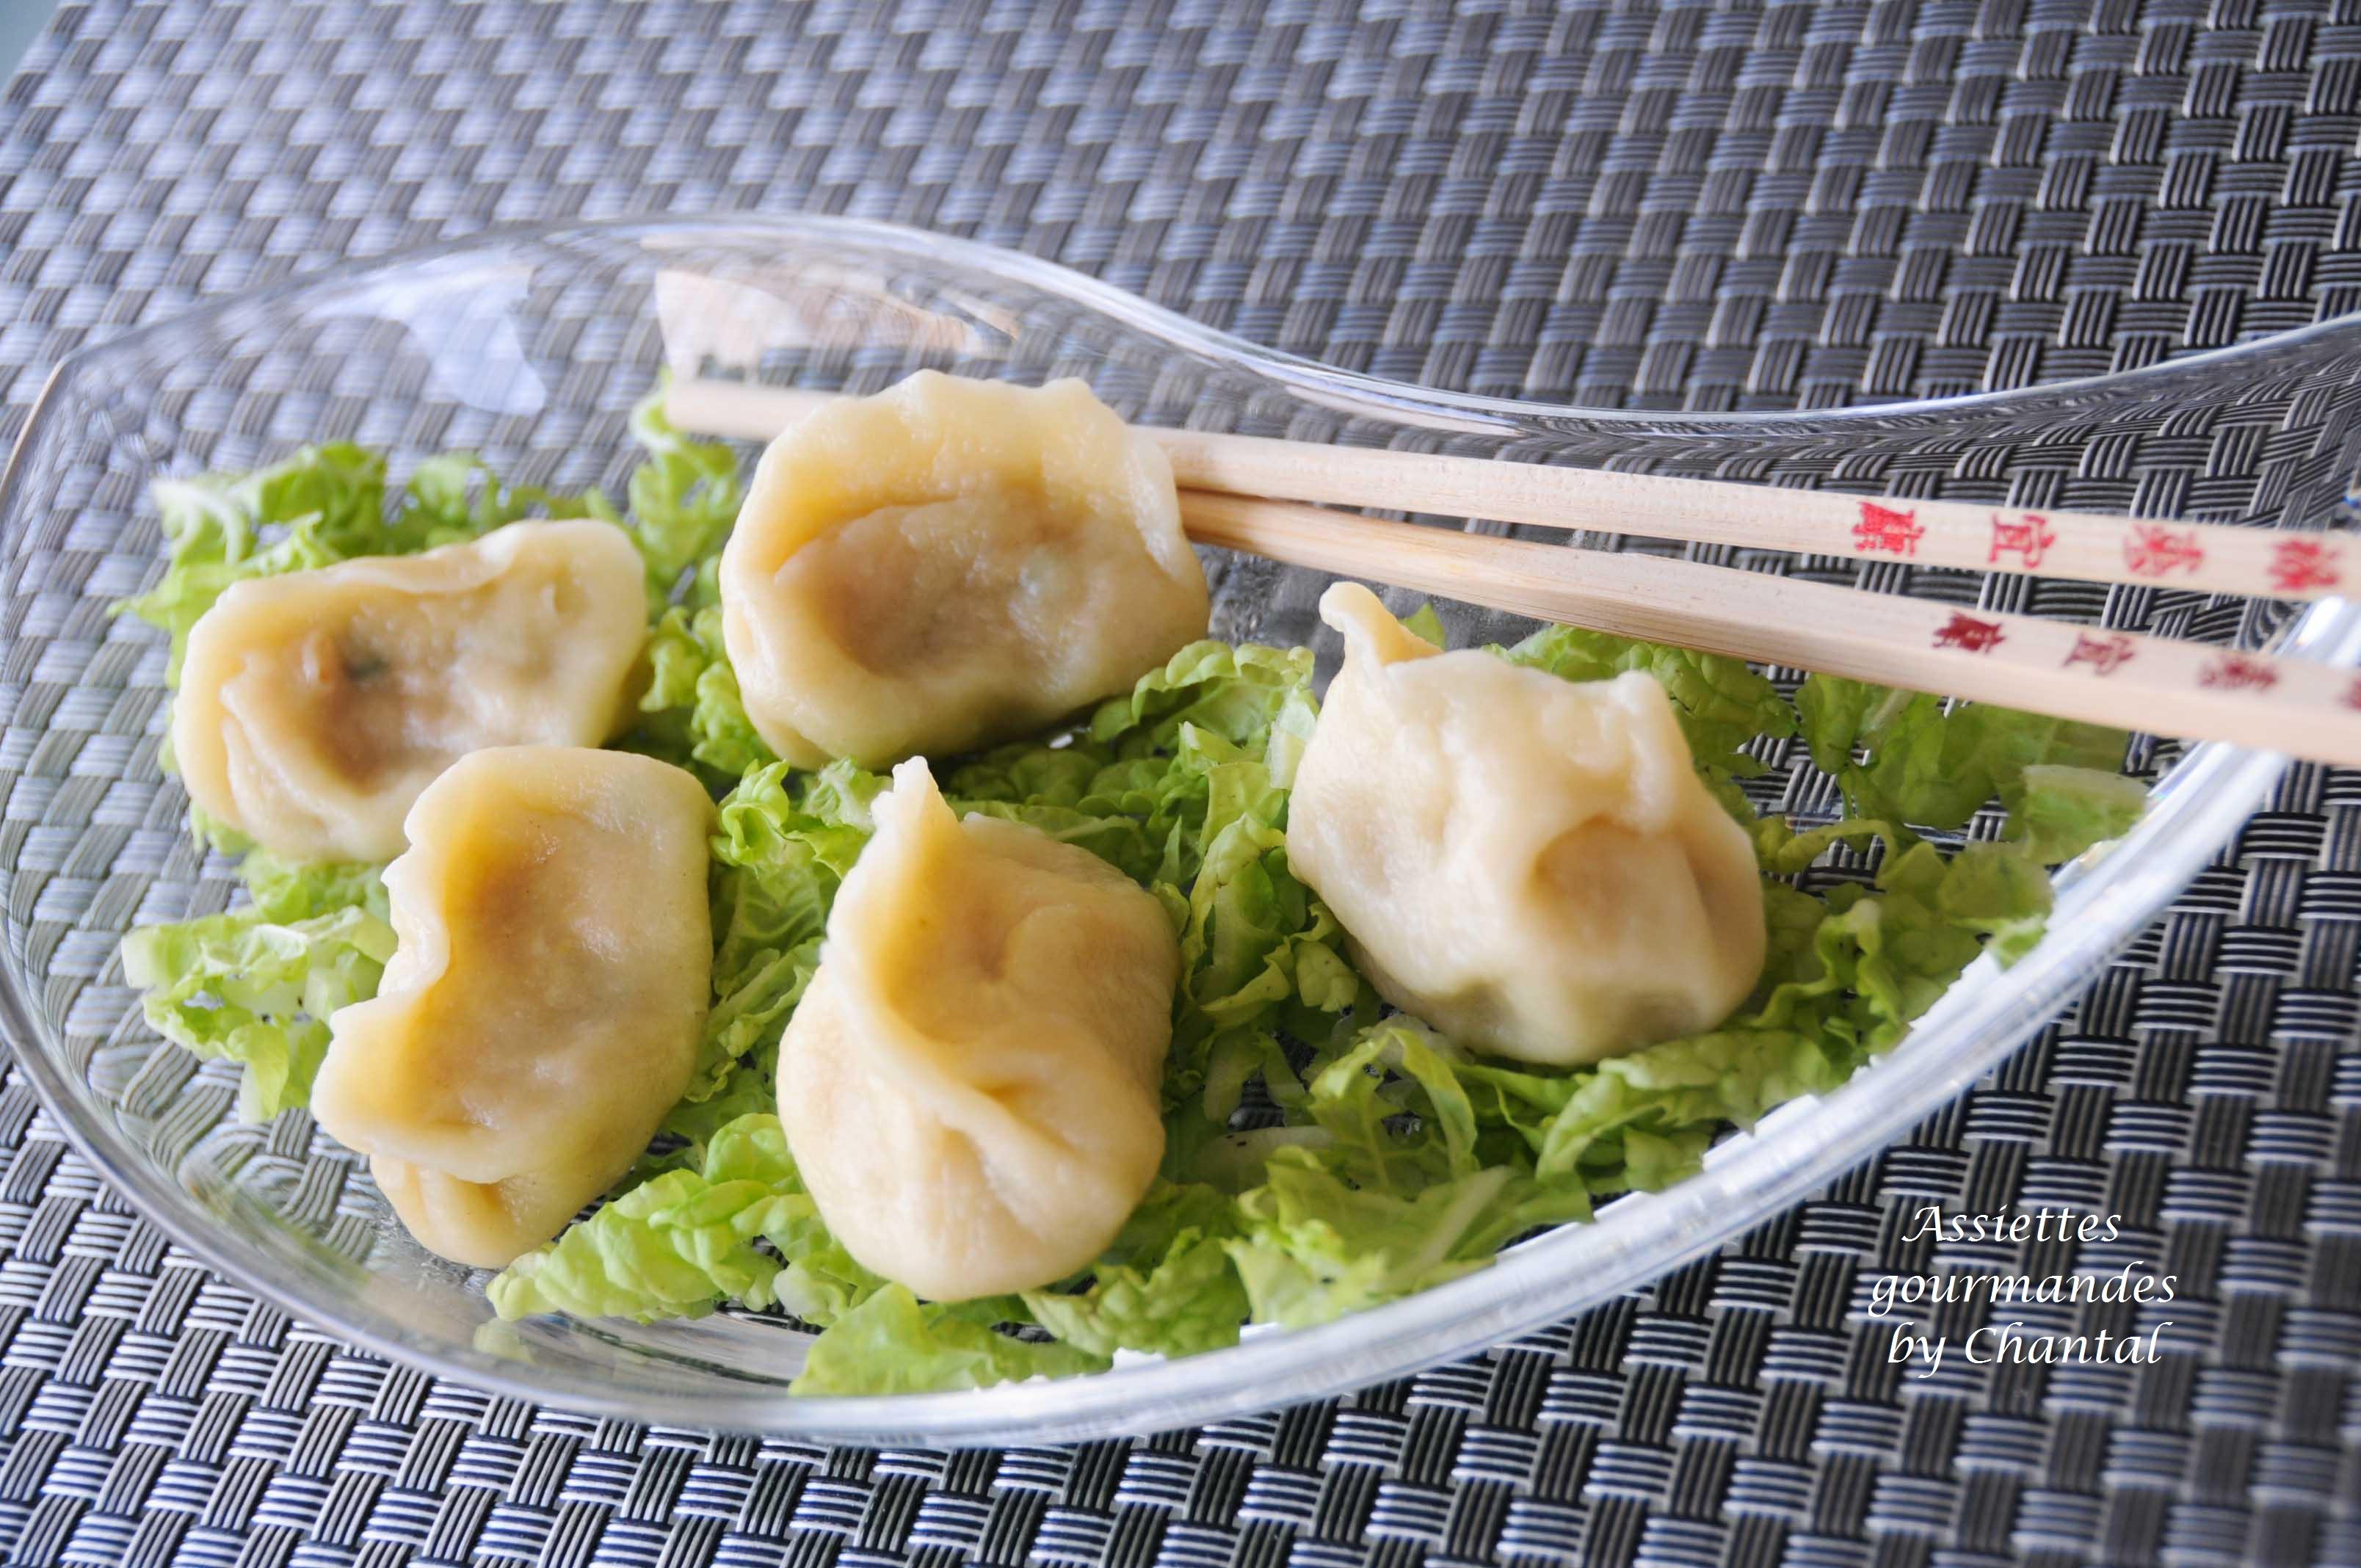 Raviolis chinois jiaozi recette p te raviolis chinois - Cuisine asiatique vapeur ...